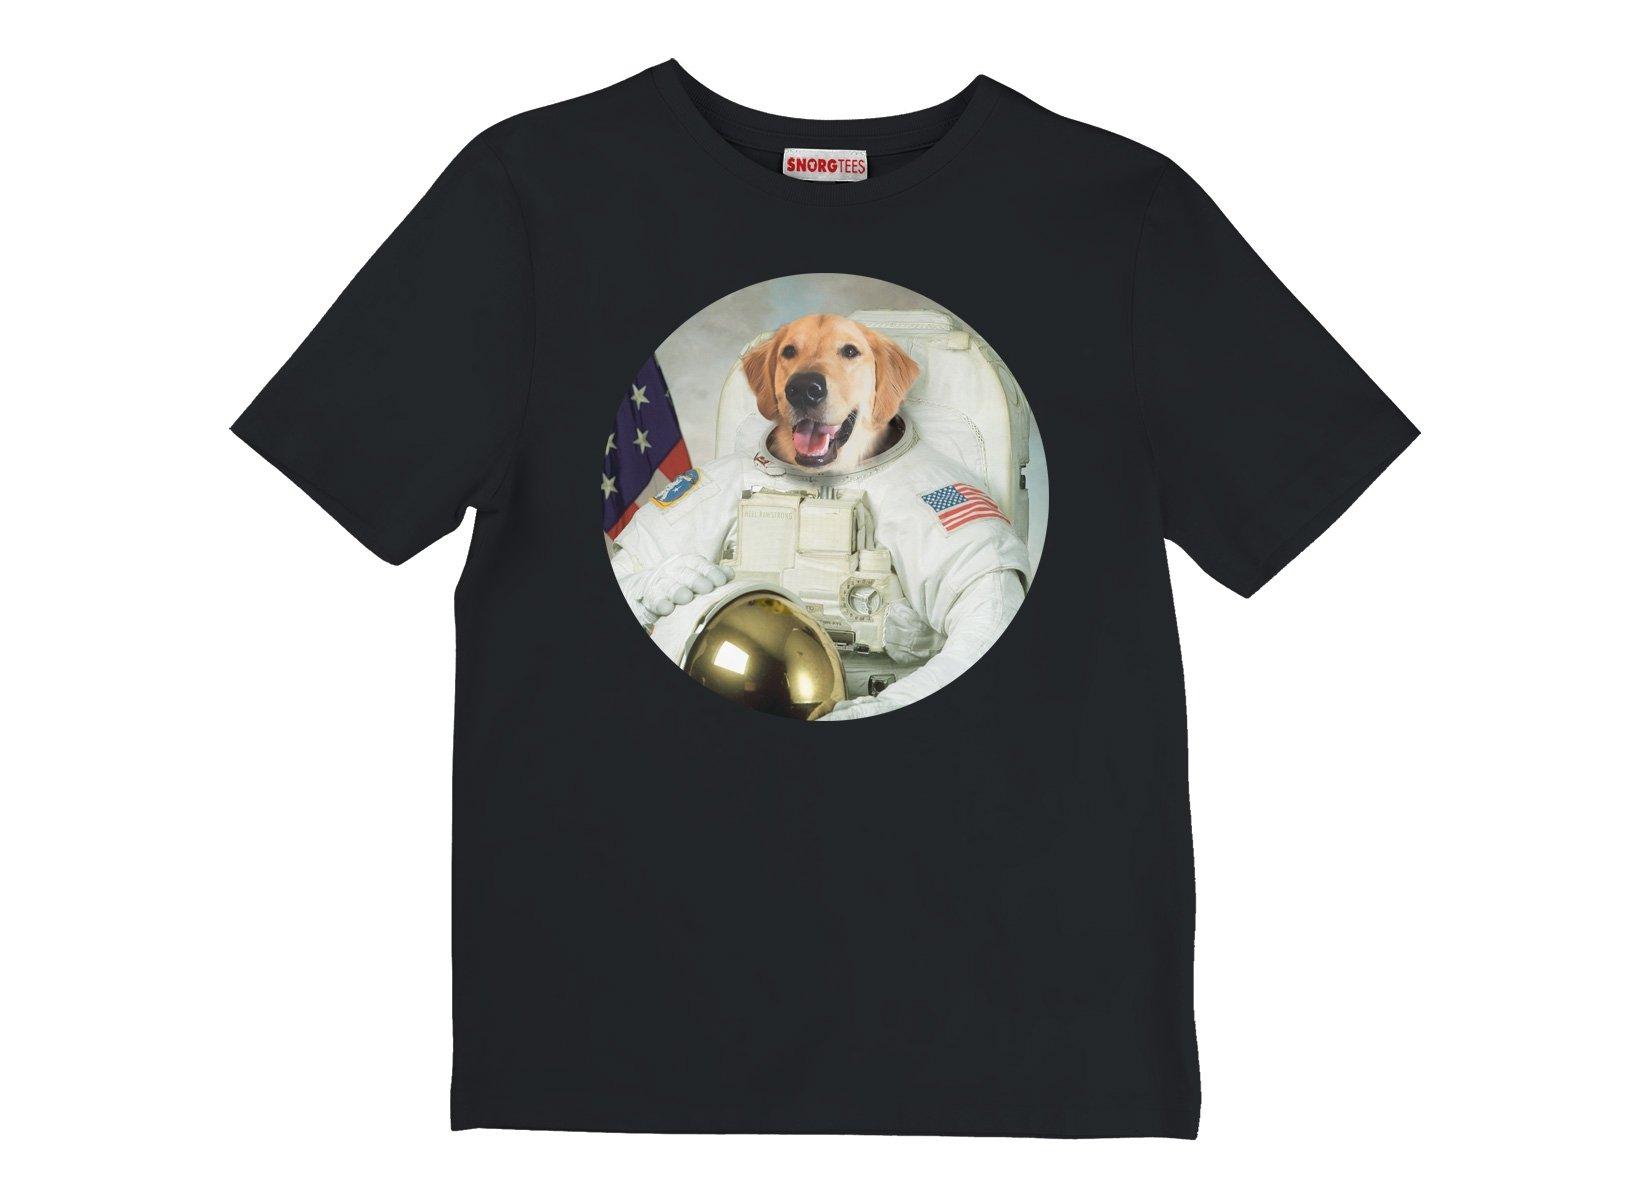 Astrodog on Kids T-Shirt